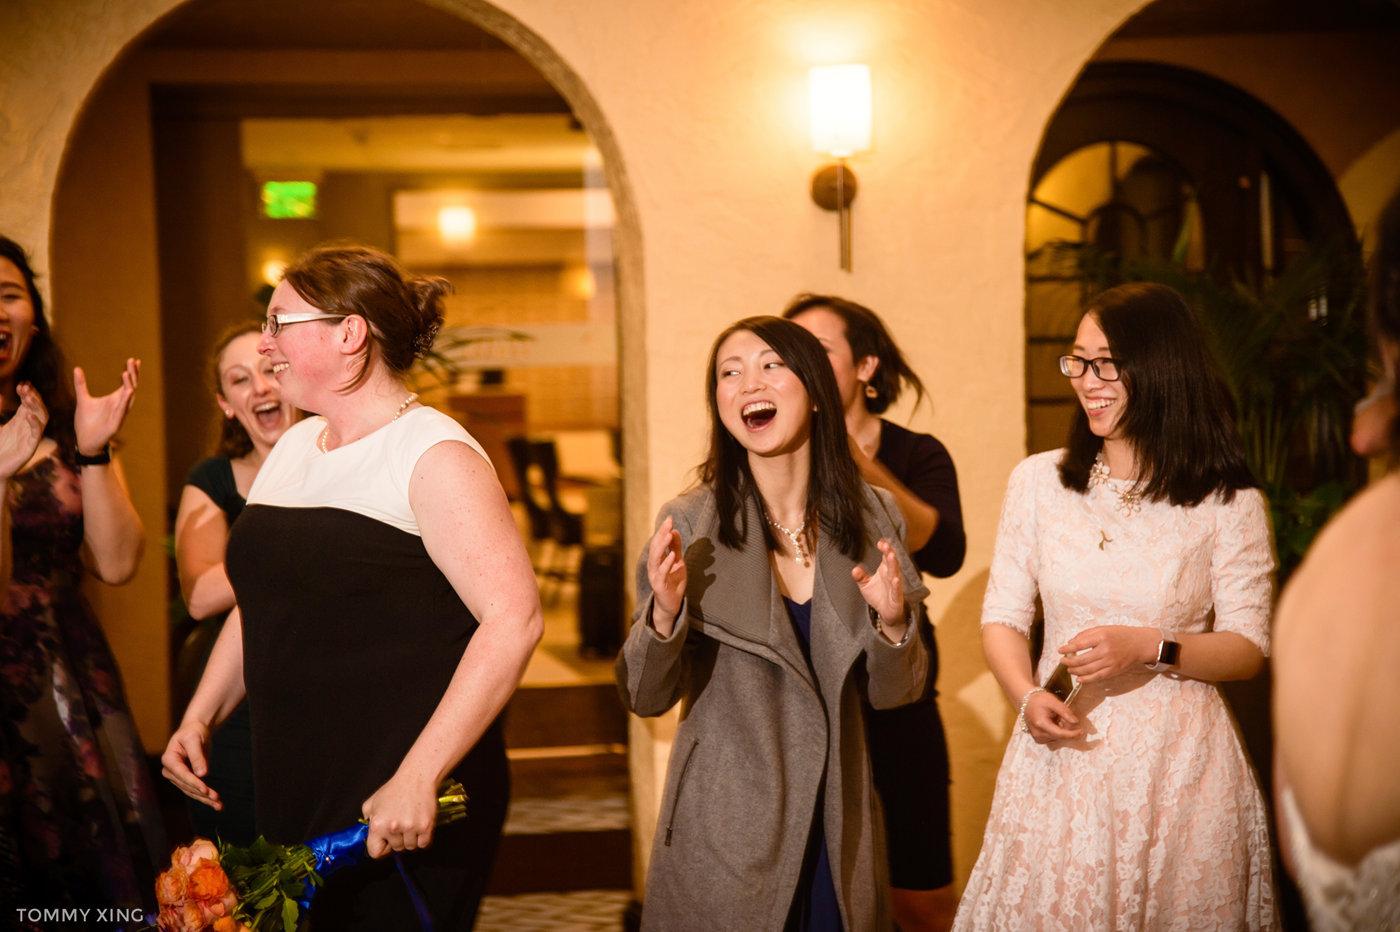 STANFORD MEMORIAL CHURCH WEDDING - Wenjie & Chengcheng - SAN FRANCISCO BAY AREA 斯坦福教堂婚礼跟拍 - 洛杉矶婚礼婚纱照摄影师 Tommy Xing Photography245.jpg